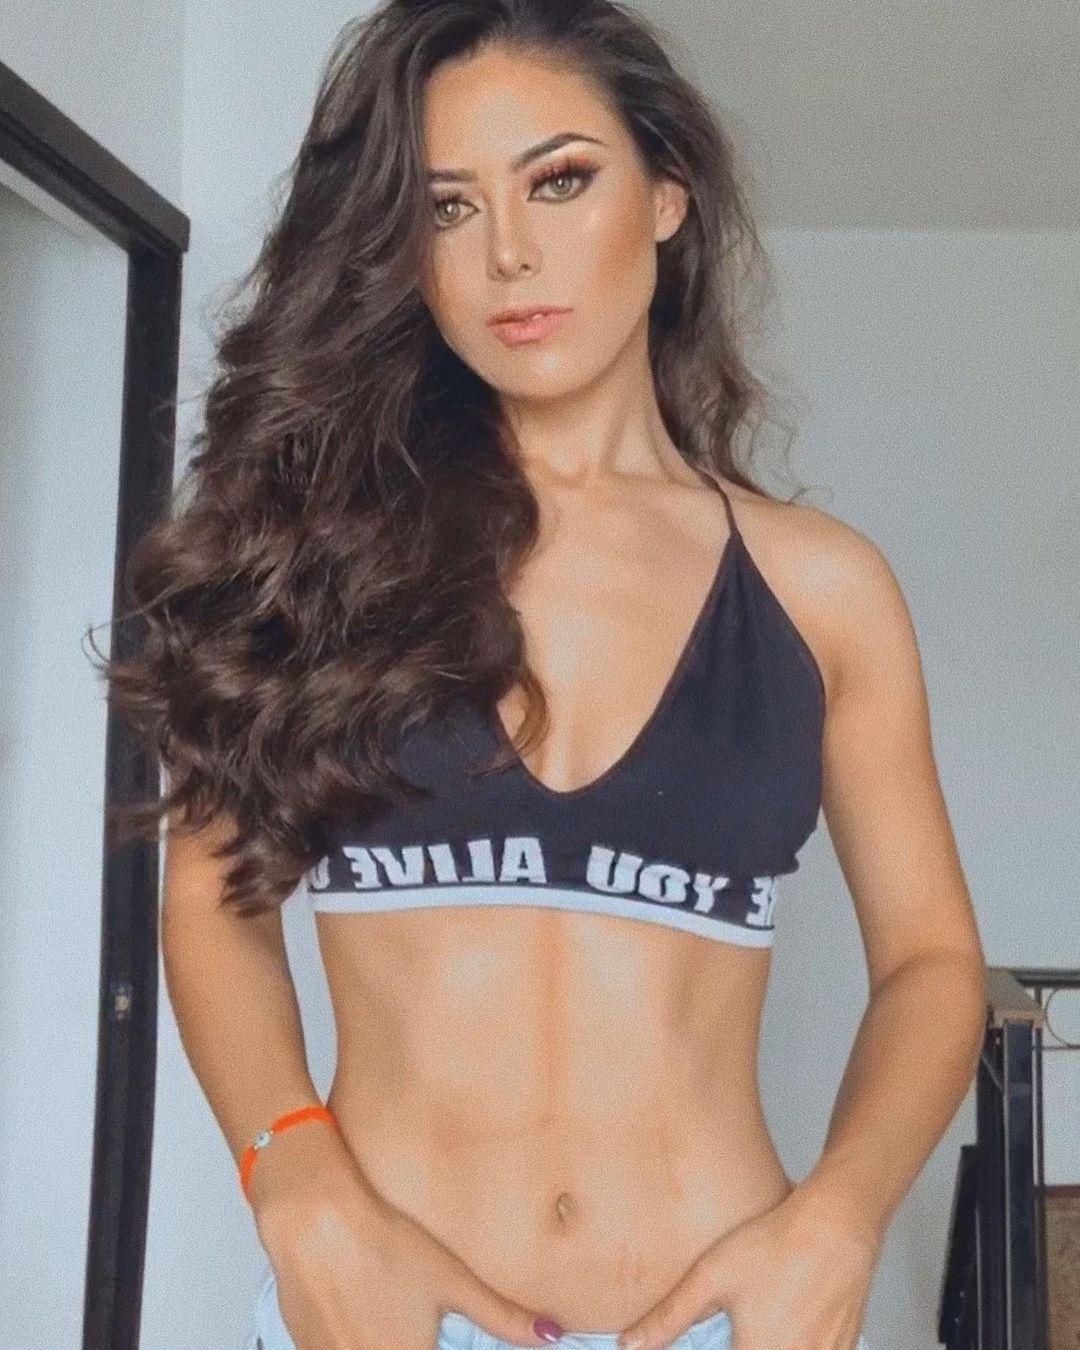 ana lucila linaje, mexicana universal coahuila 2020. - Página 3 Lucila11